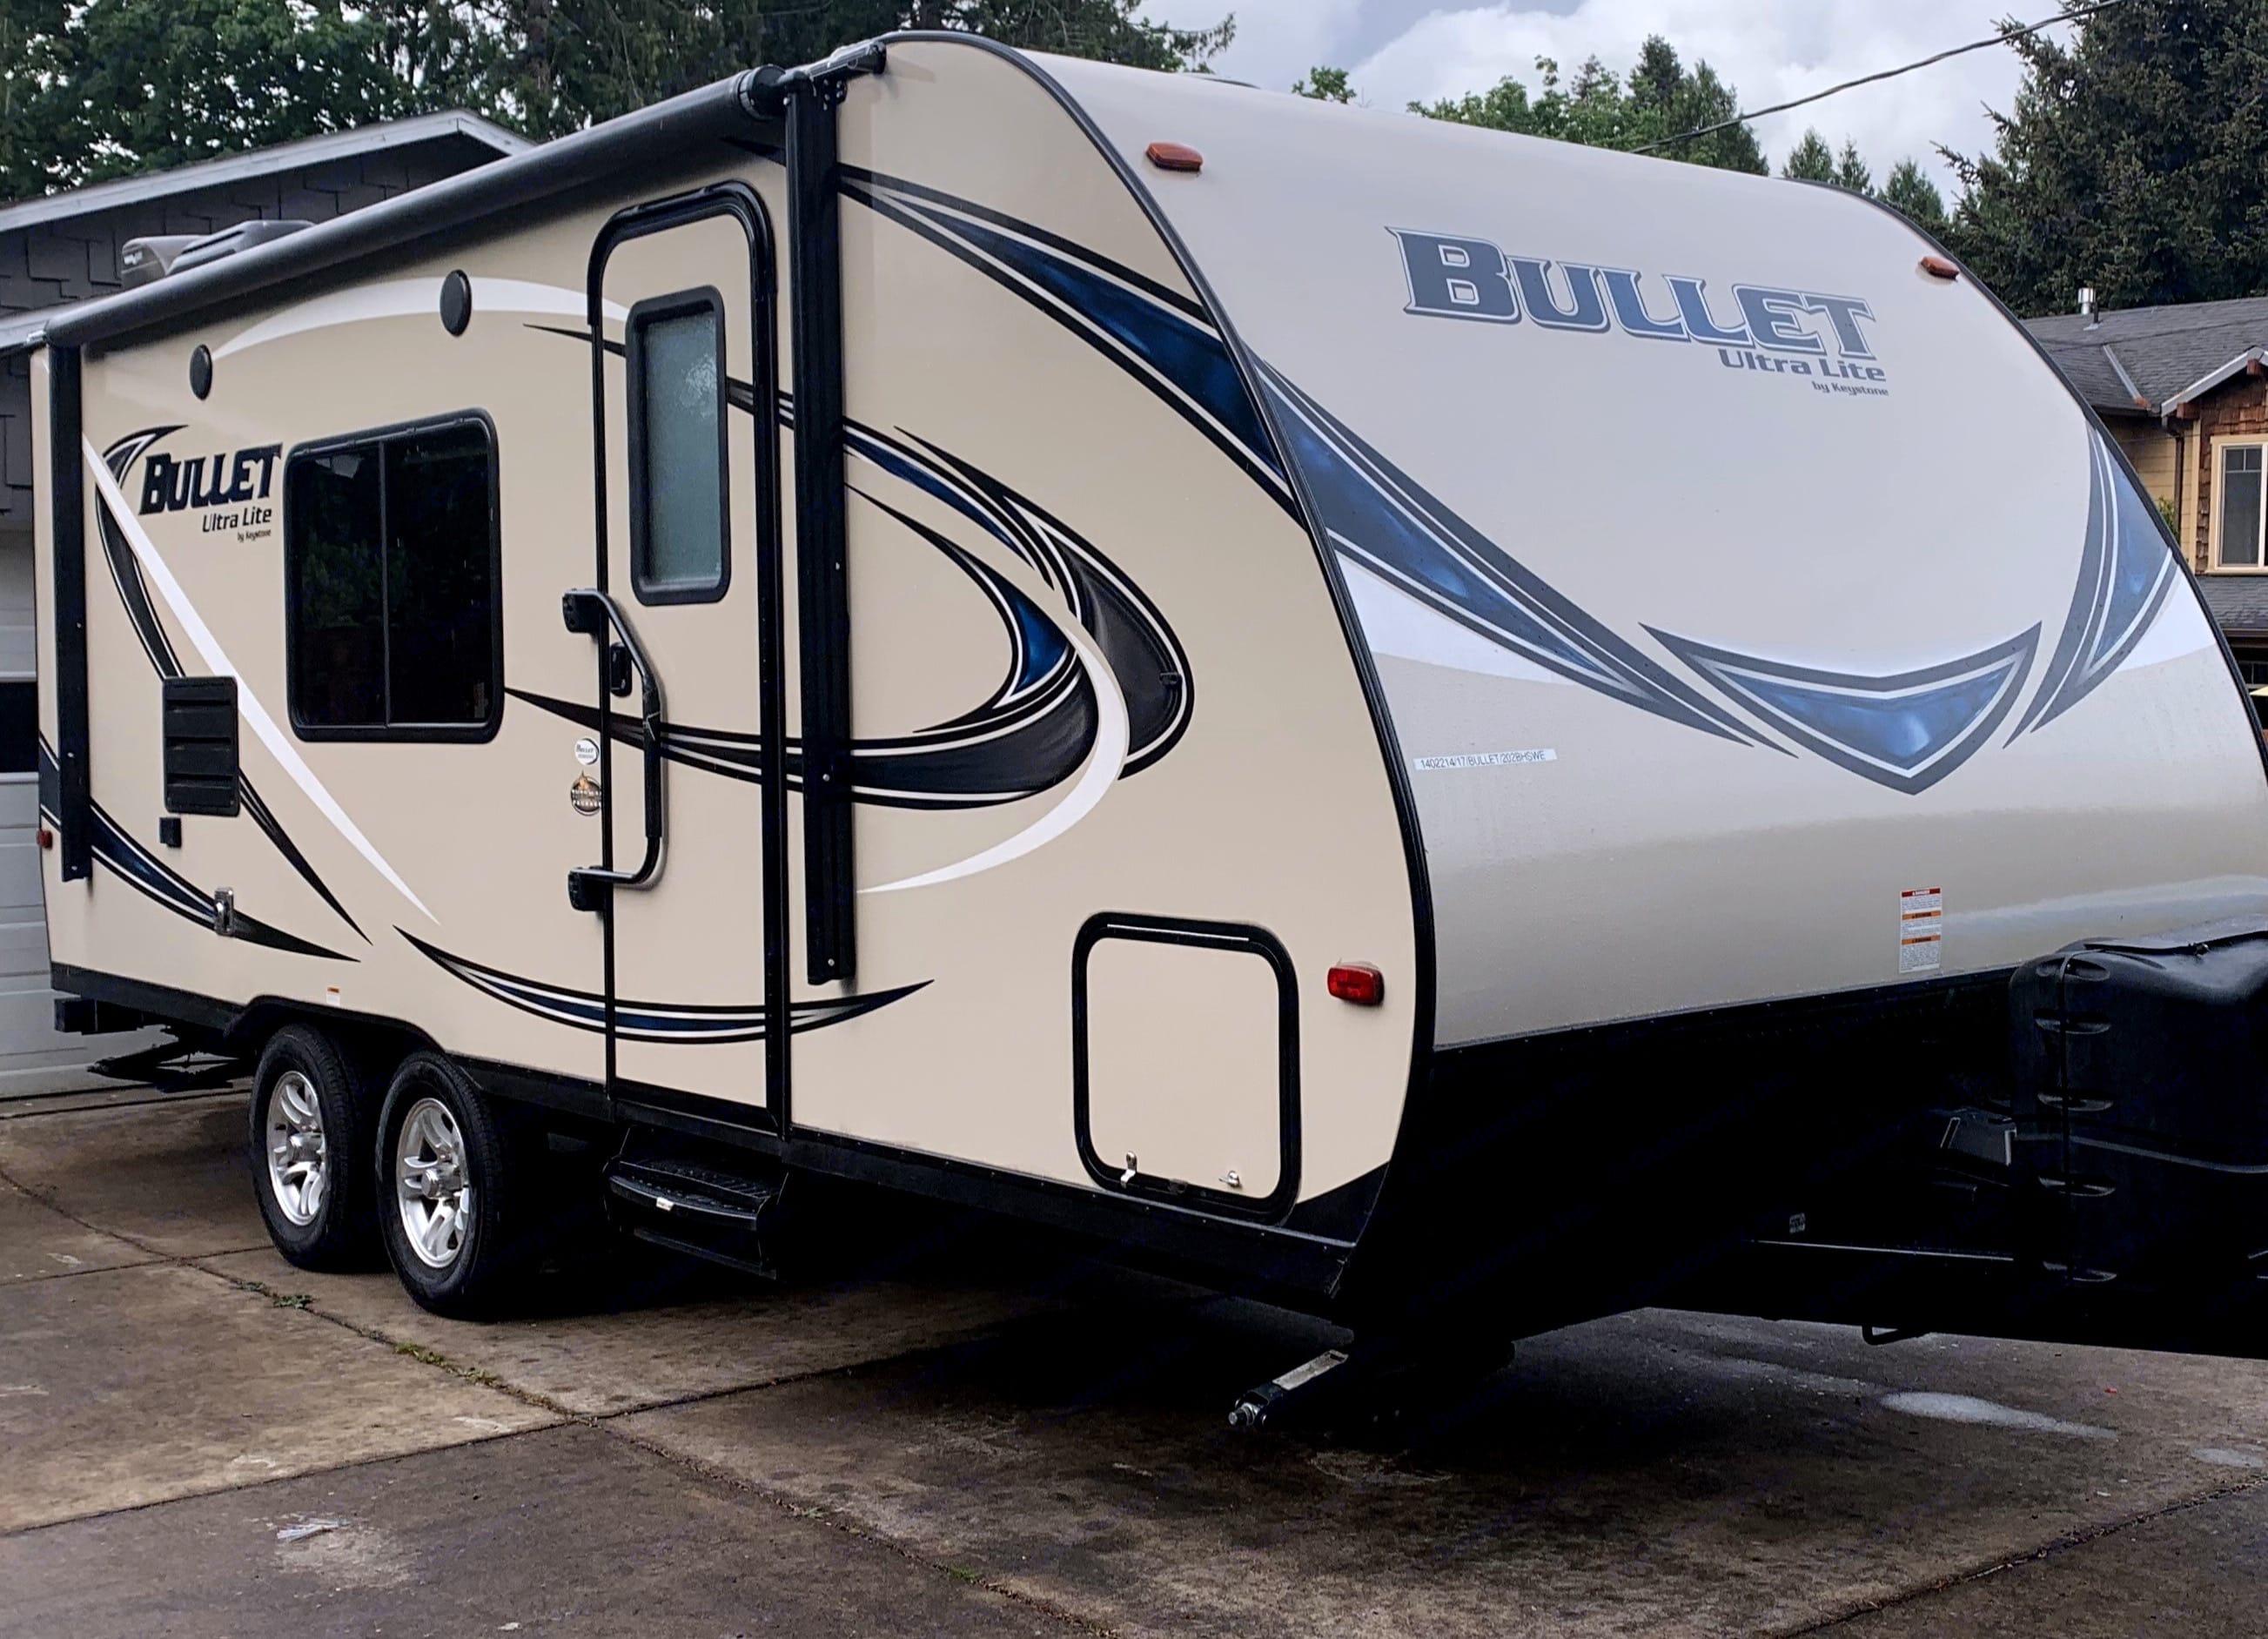 Smooth riding 23ft travel trailer!. Keystone Bullet 2017